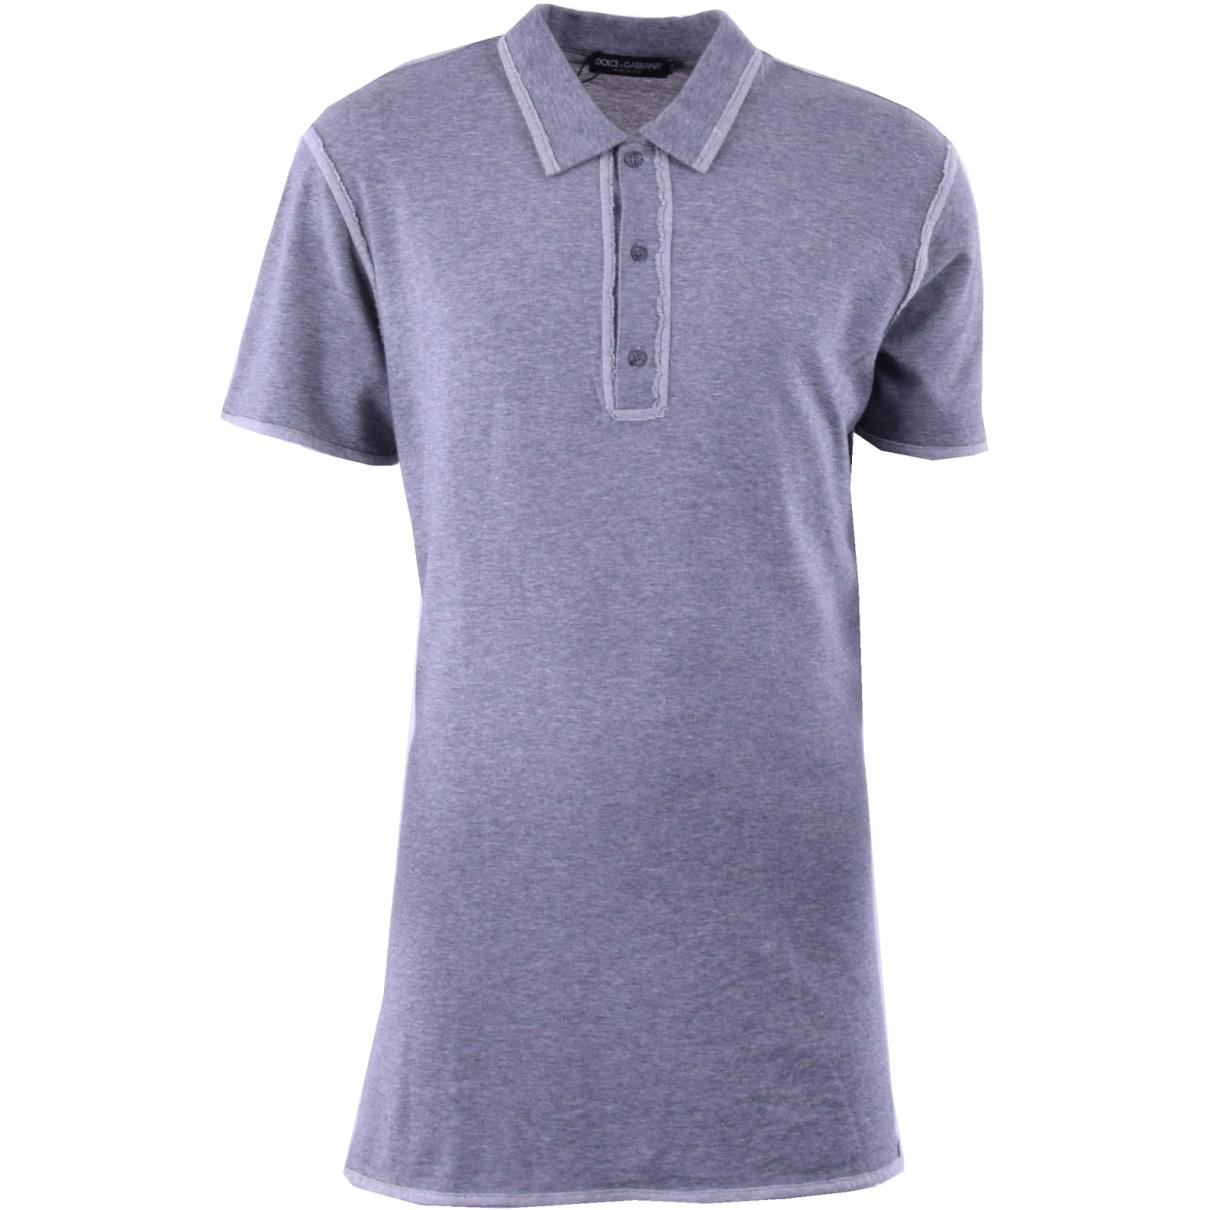 Dolce & Gabbana \N Grey Cotton Polo shirts for Men 44 IT